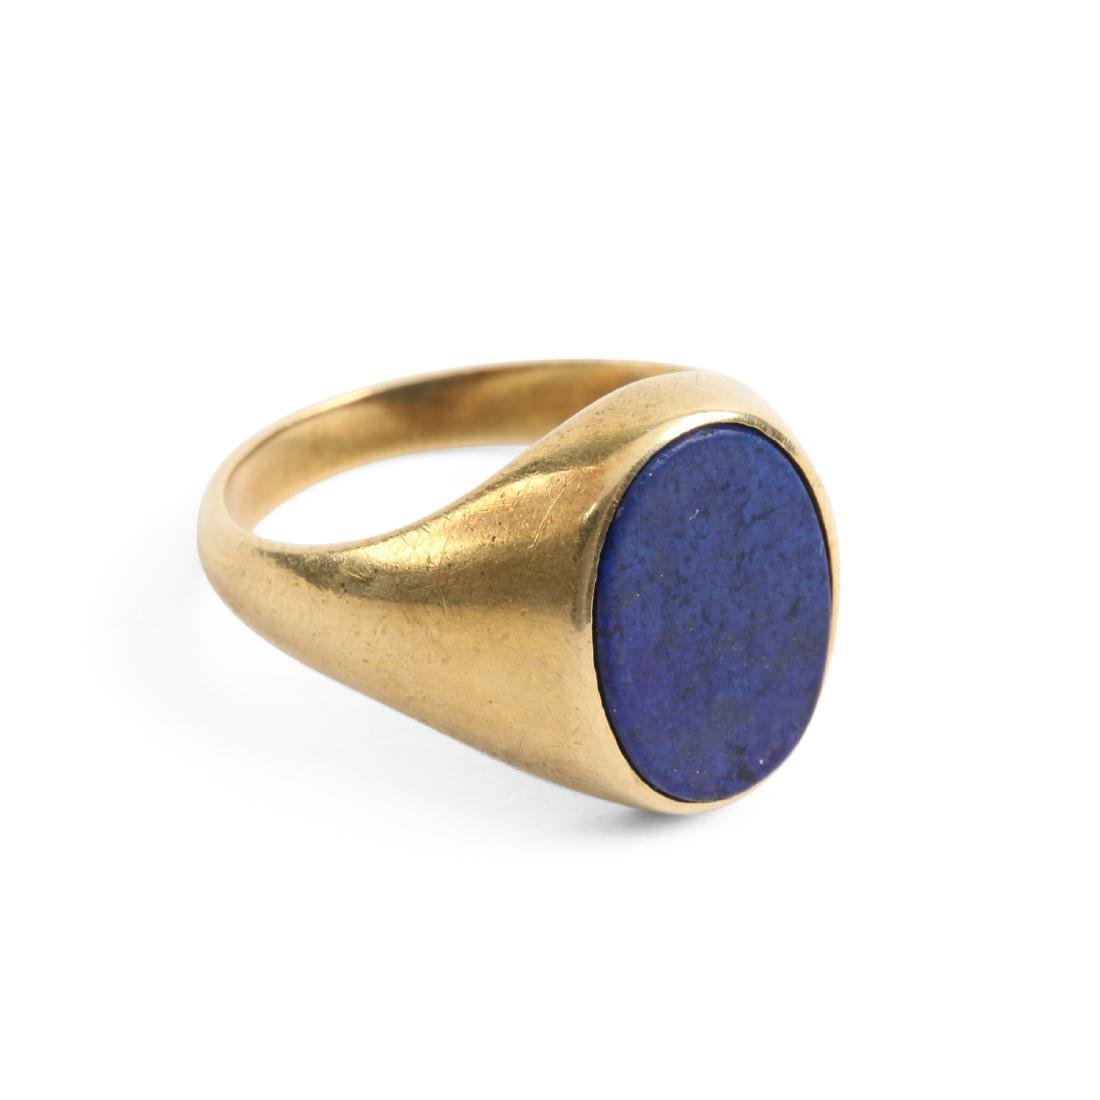 A 14K & Lapis Lazuli Dinner Ring